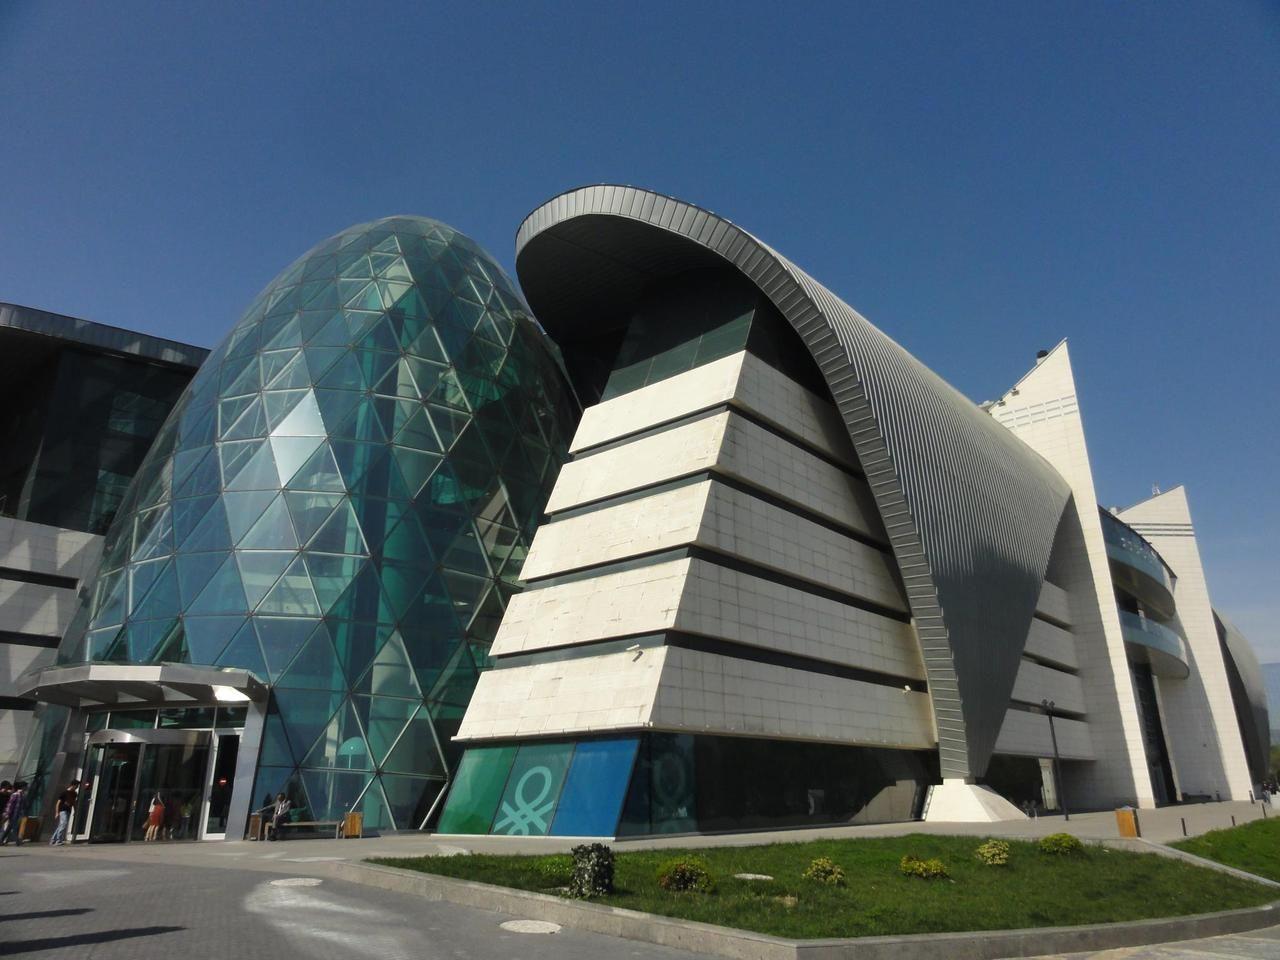 Baku Park Boulevard Shopping Center Azerbaijan Architecture Shopping Tour Shopping Center Architecture